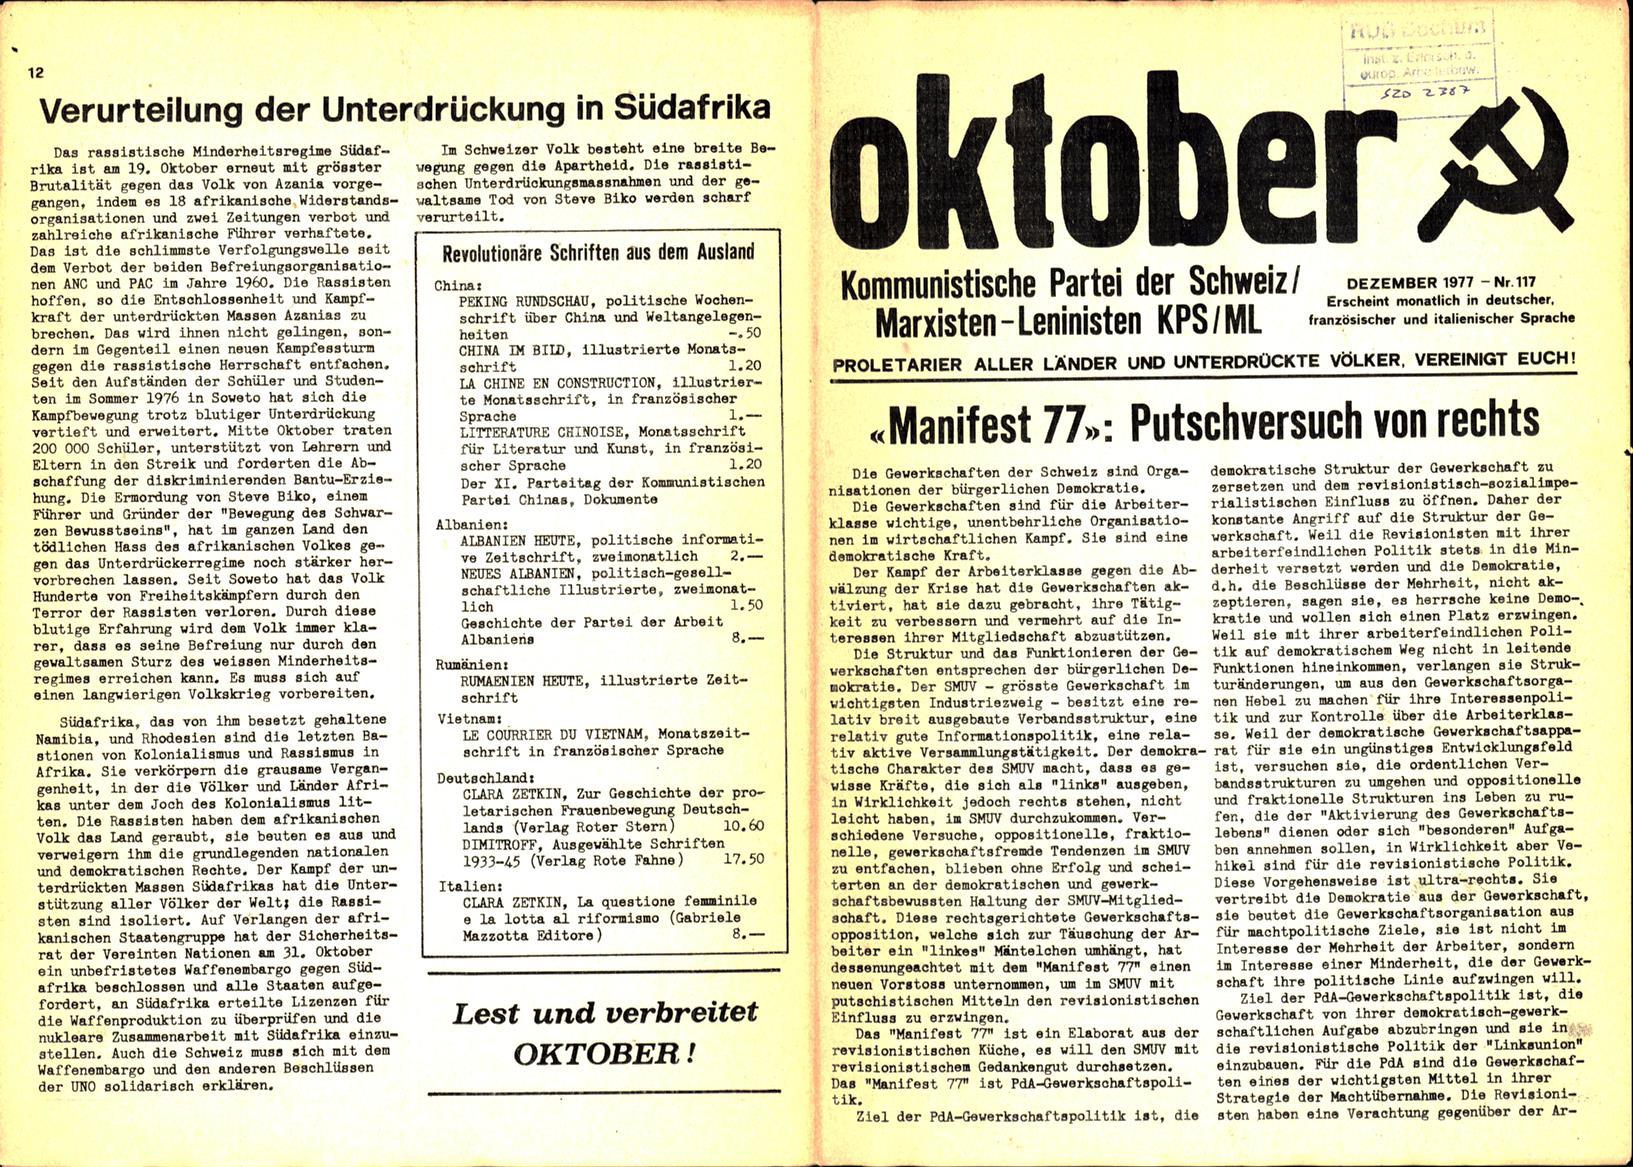 Schweiz_KPSML_Oktober_19771200_117_001